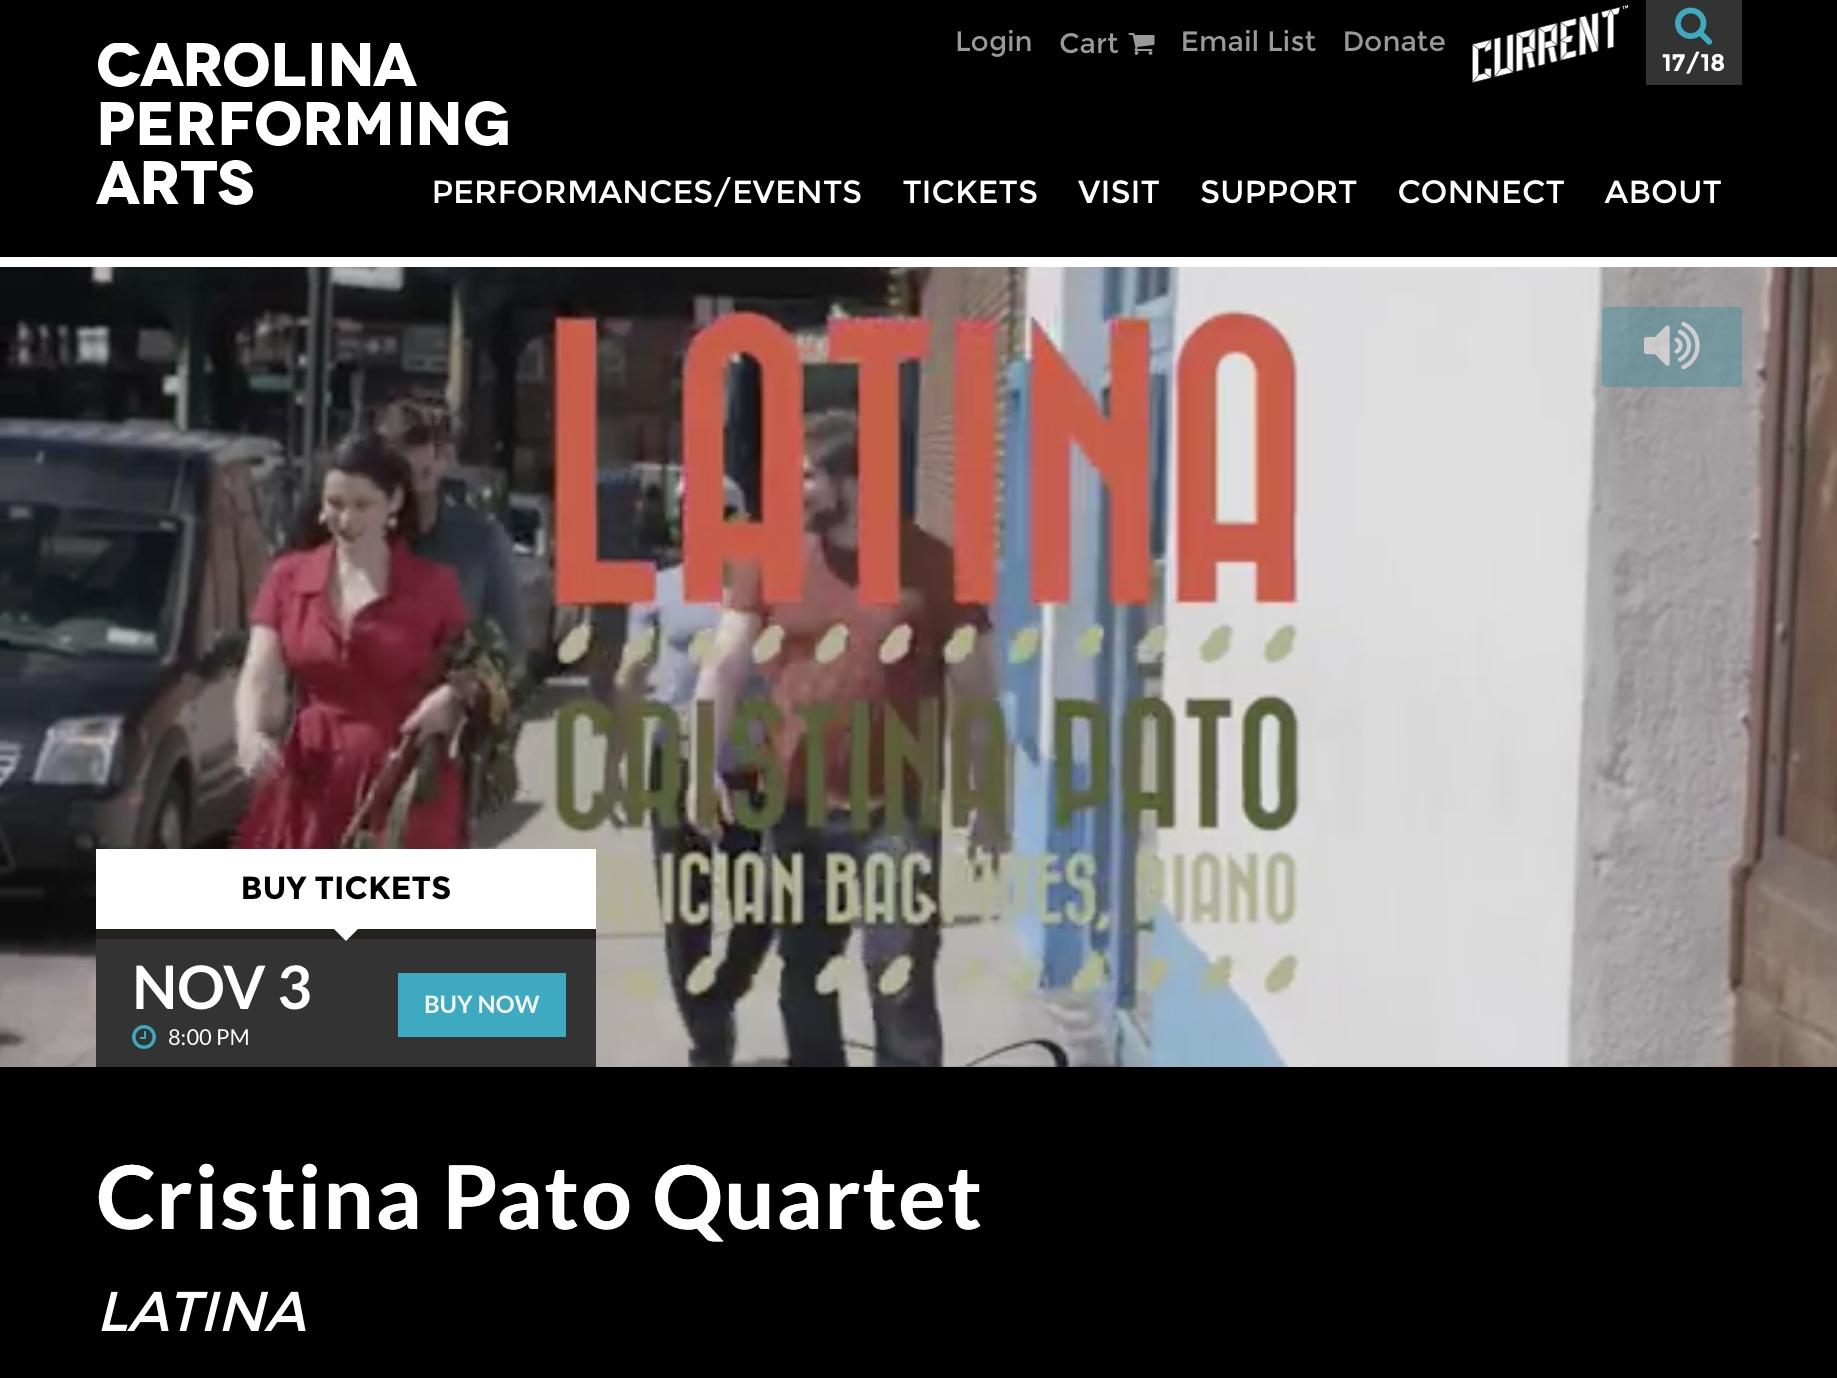 Carolina Performing Arts Concert